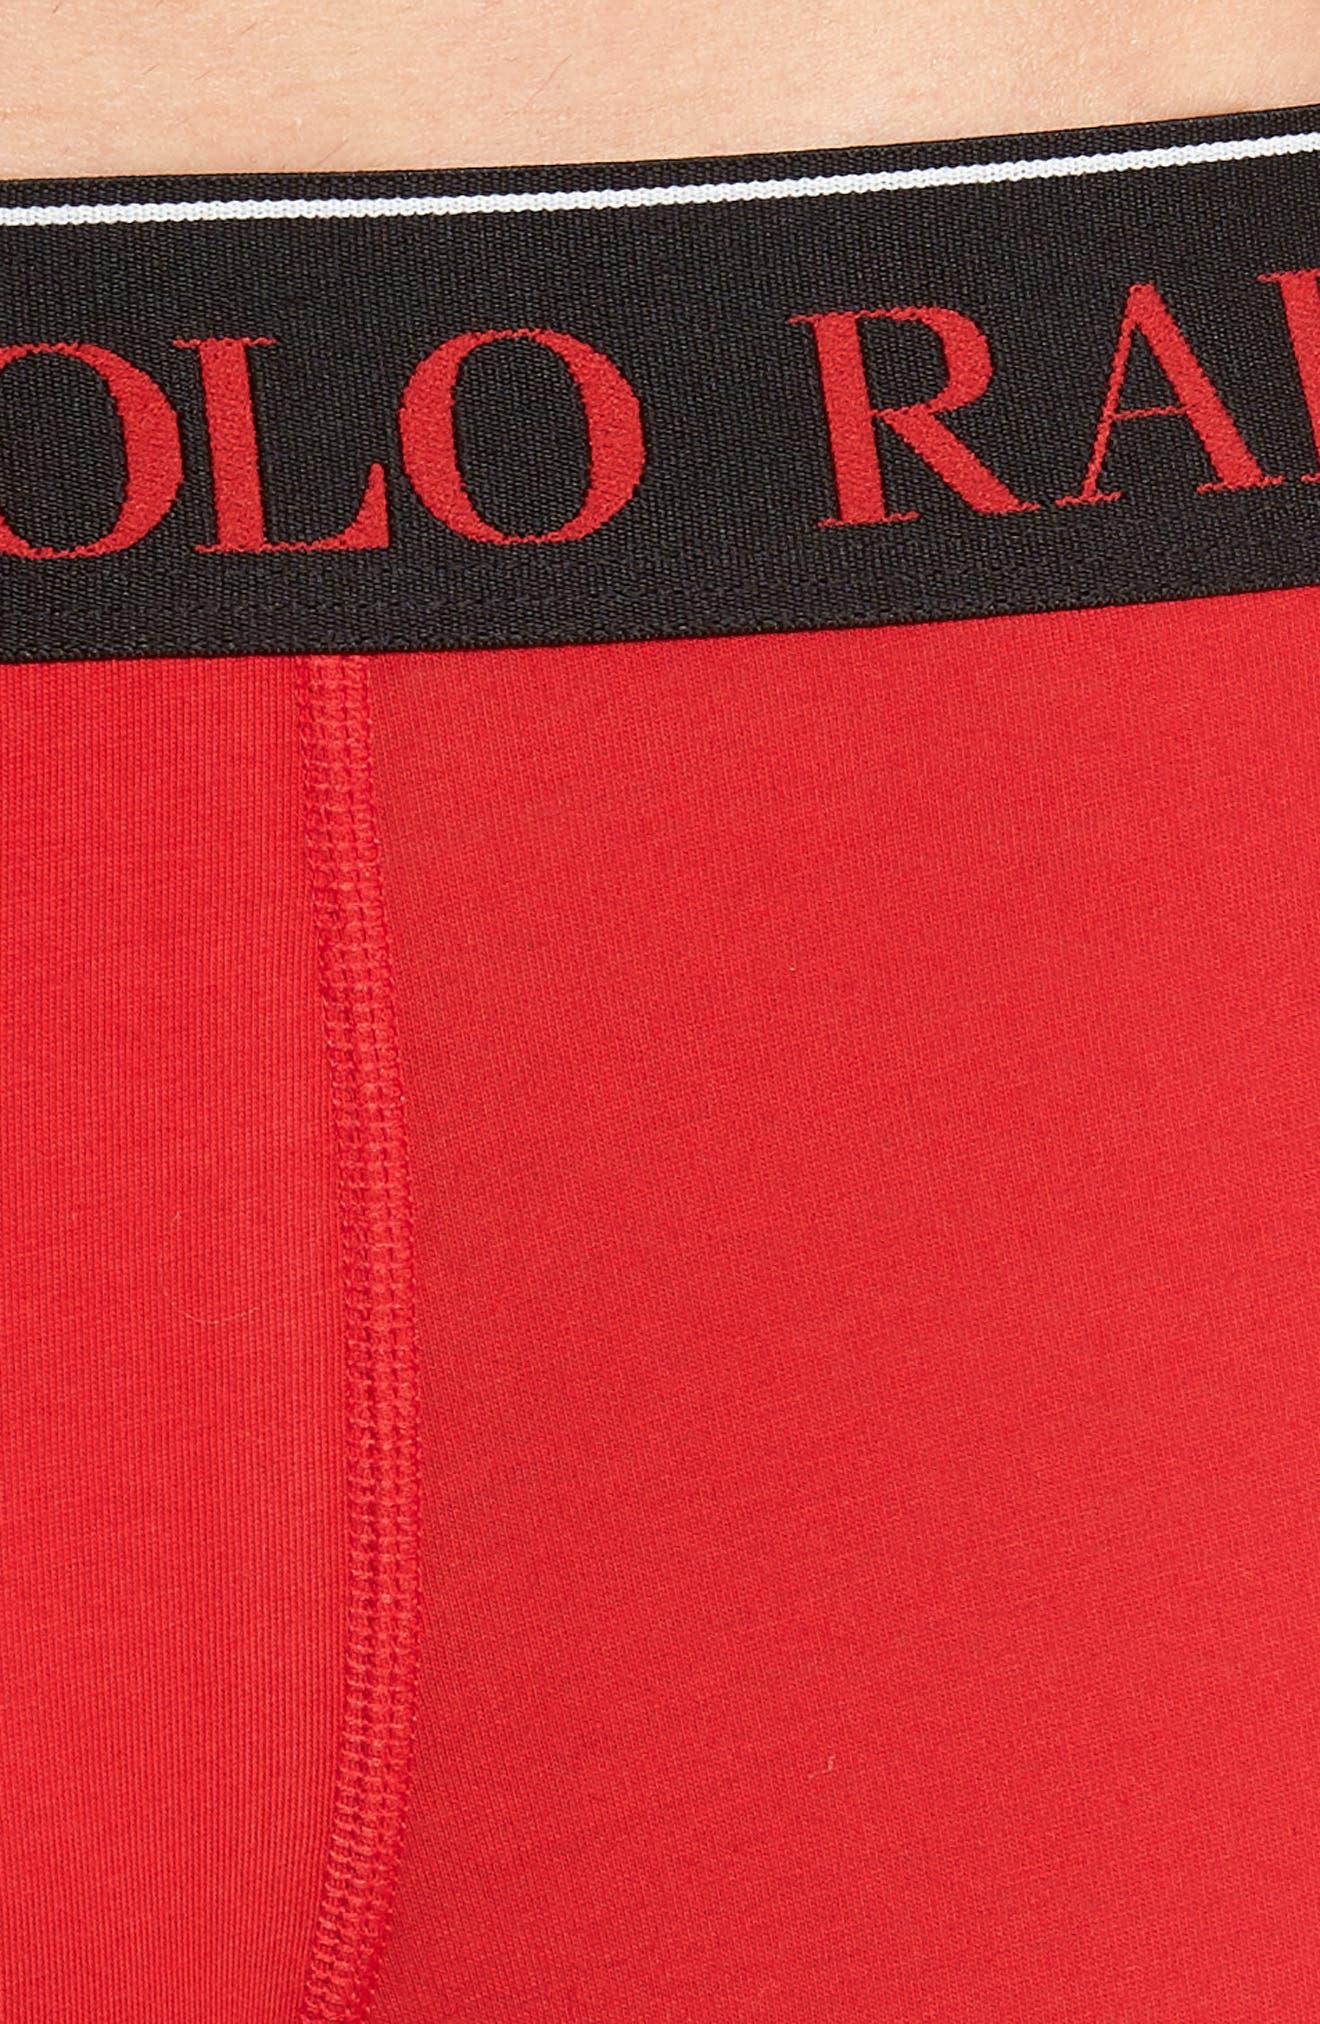 Cotton Stretch Boxer Briefs,                             Alternate thumbnail 4, color,                             RL 2000 RED/ POLO BLACK